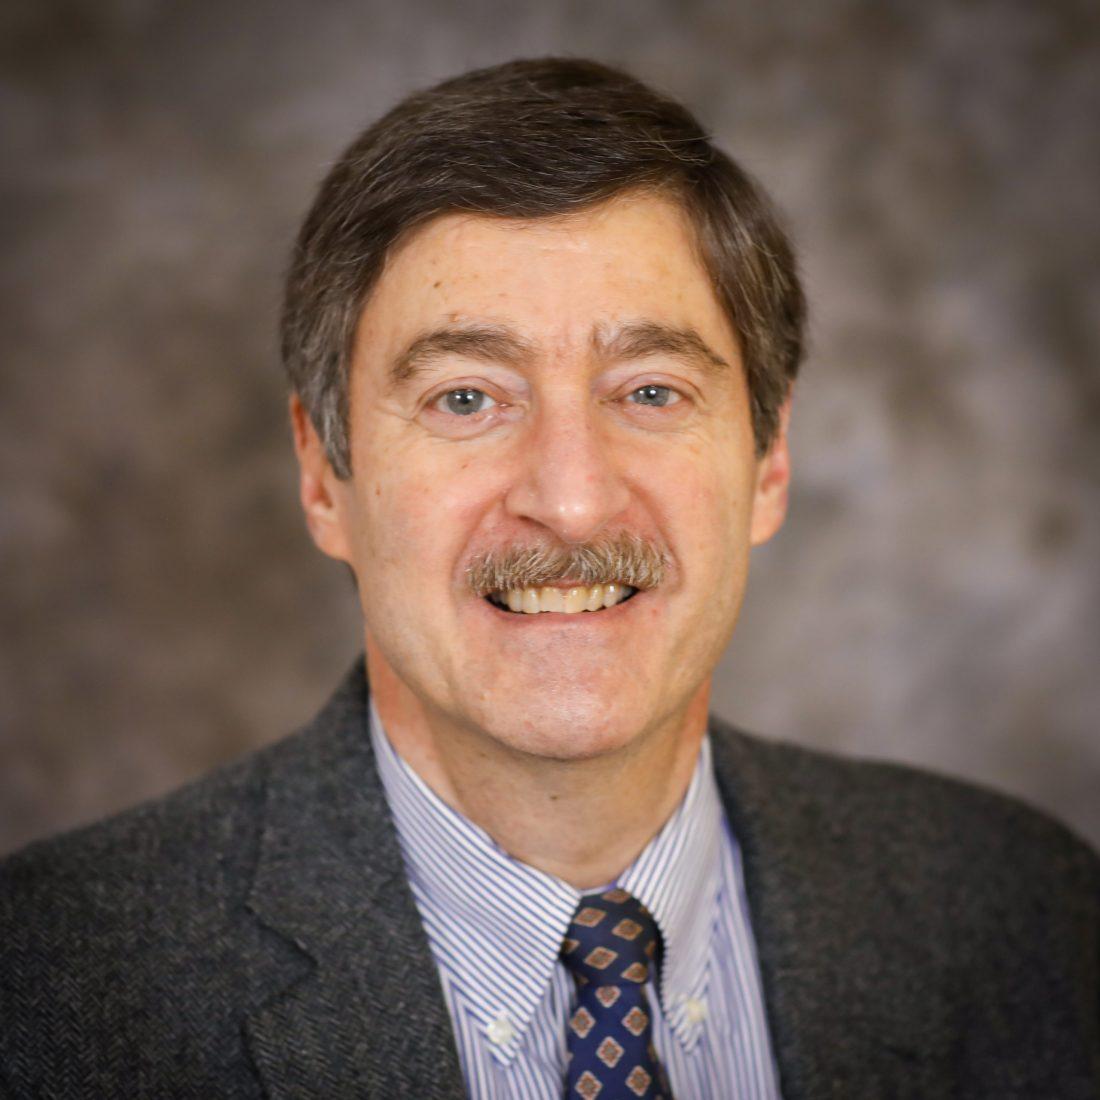 Jeffrey Orens